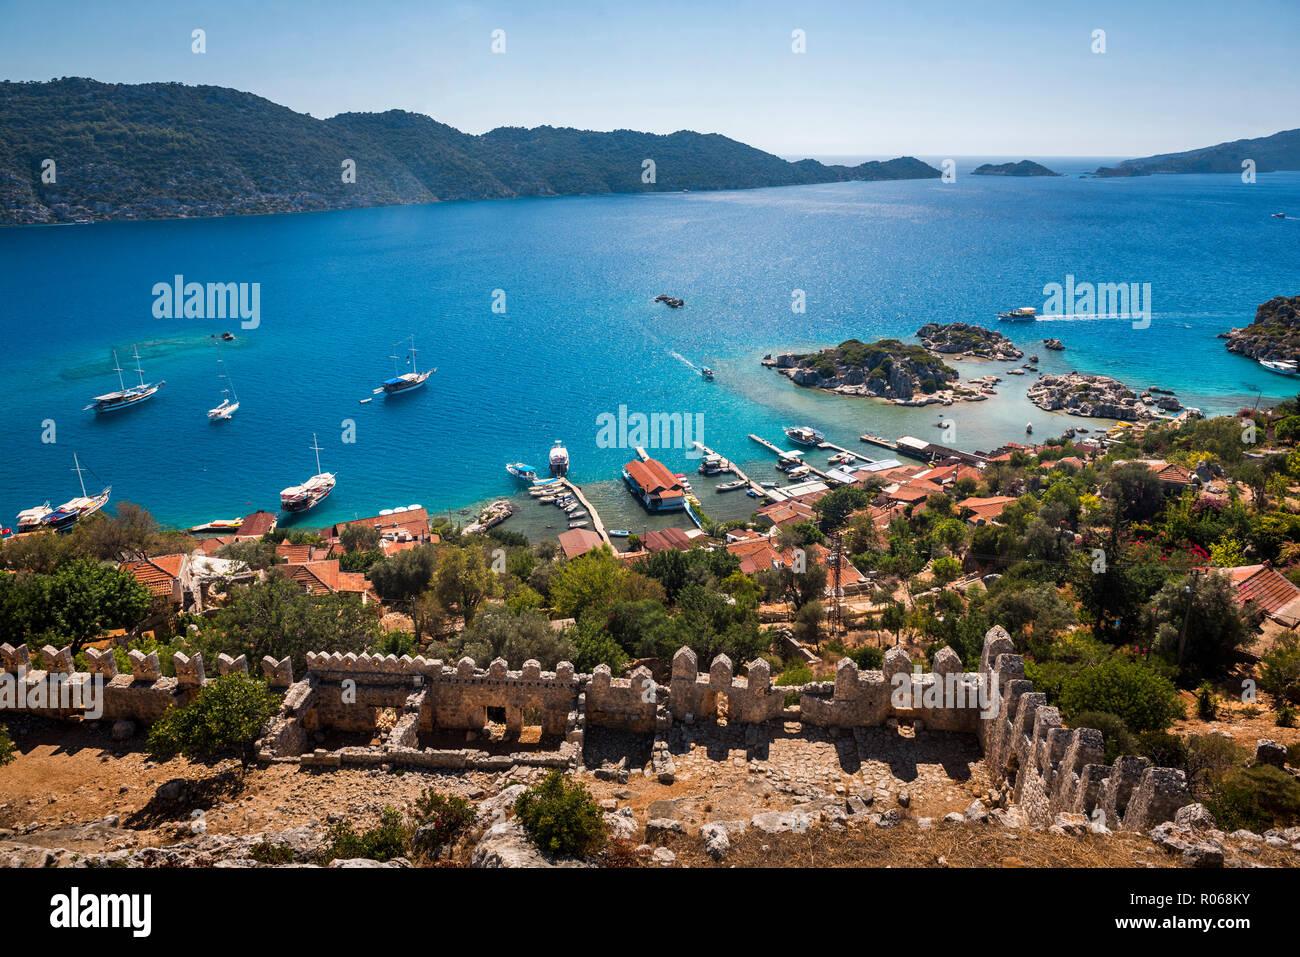 Sunken City of Kekova seen from Simena Castle, Antalya Province, Lycia, Anatolia, Mediterranean Sea, Turkey, Asia Minor, Eurasia - Stock Image